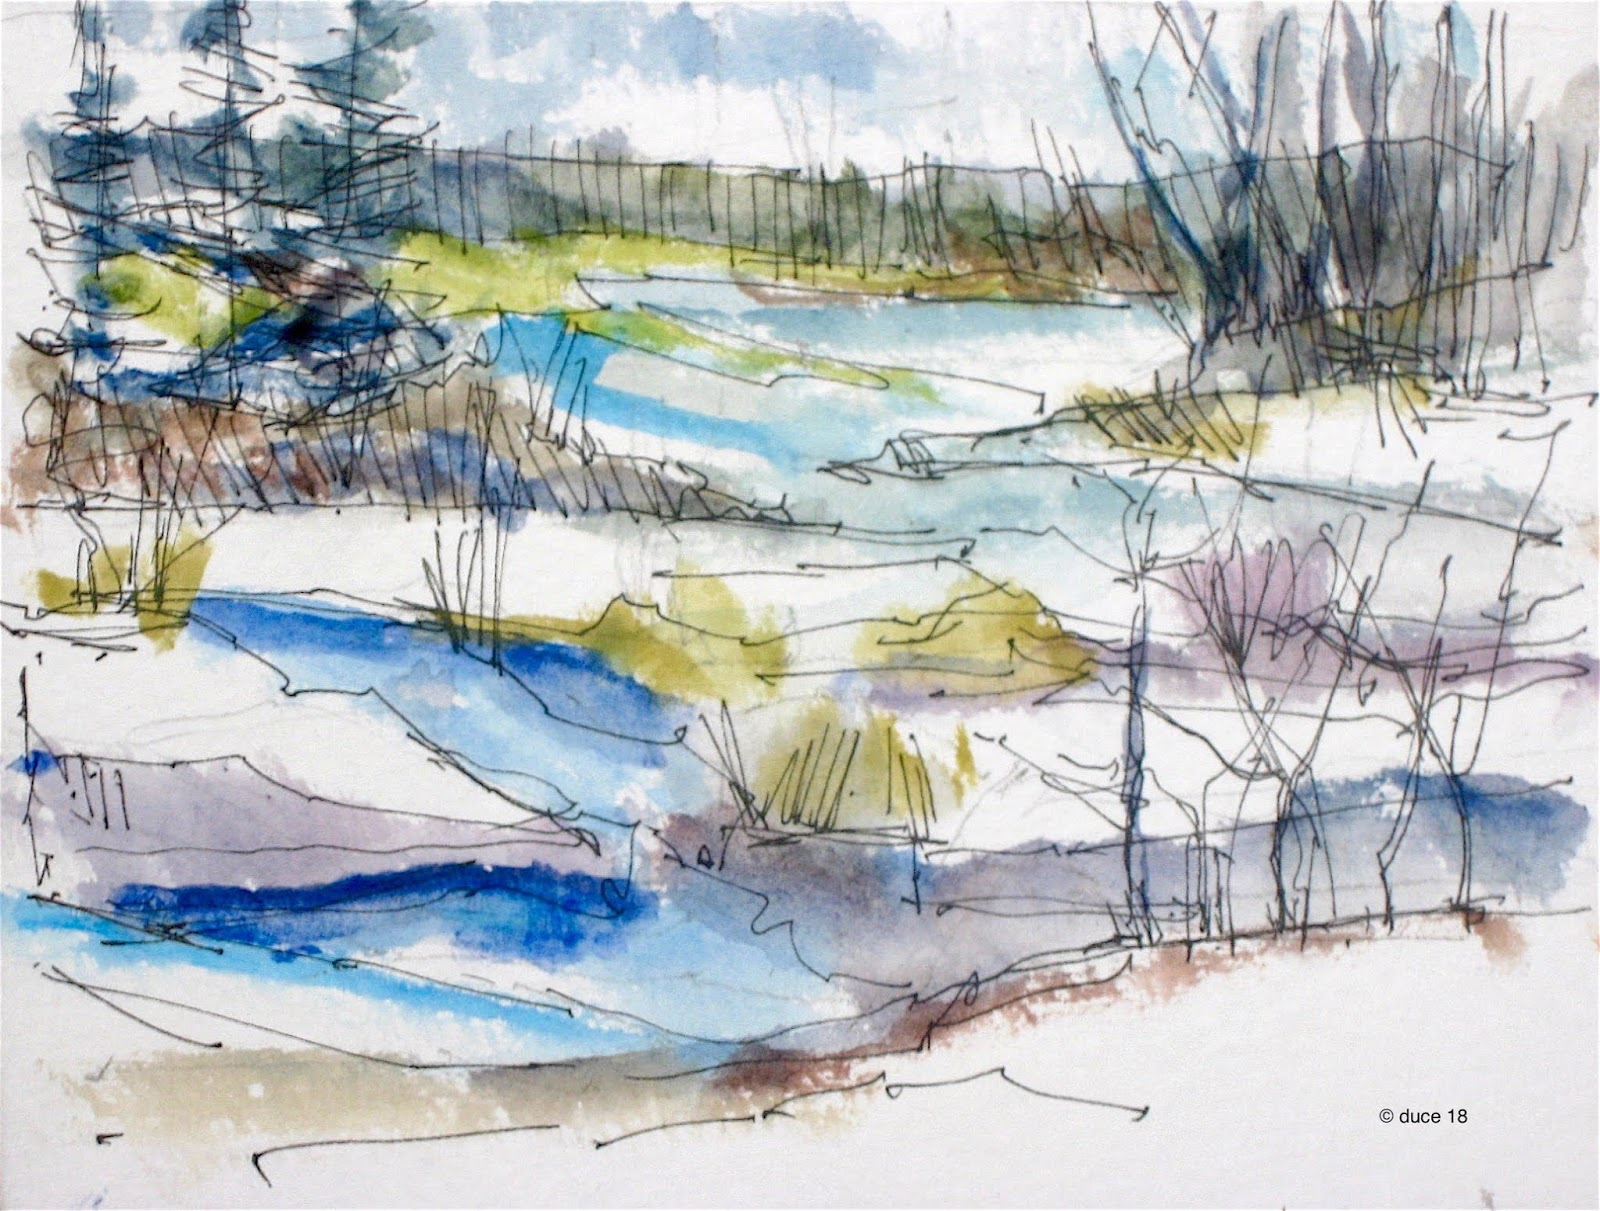 Winter River, December 10, 2018 - Anthony Duce,  https://tonyducesart.blogspot.com